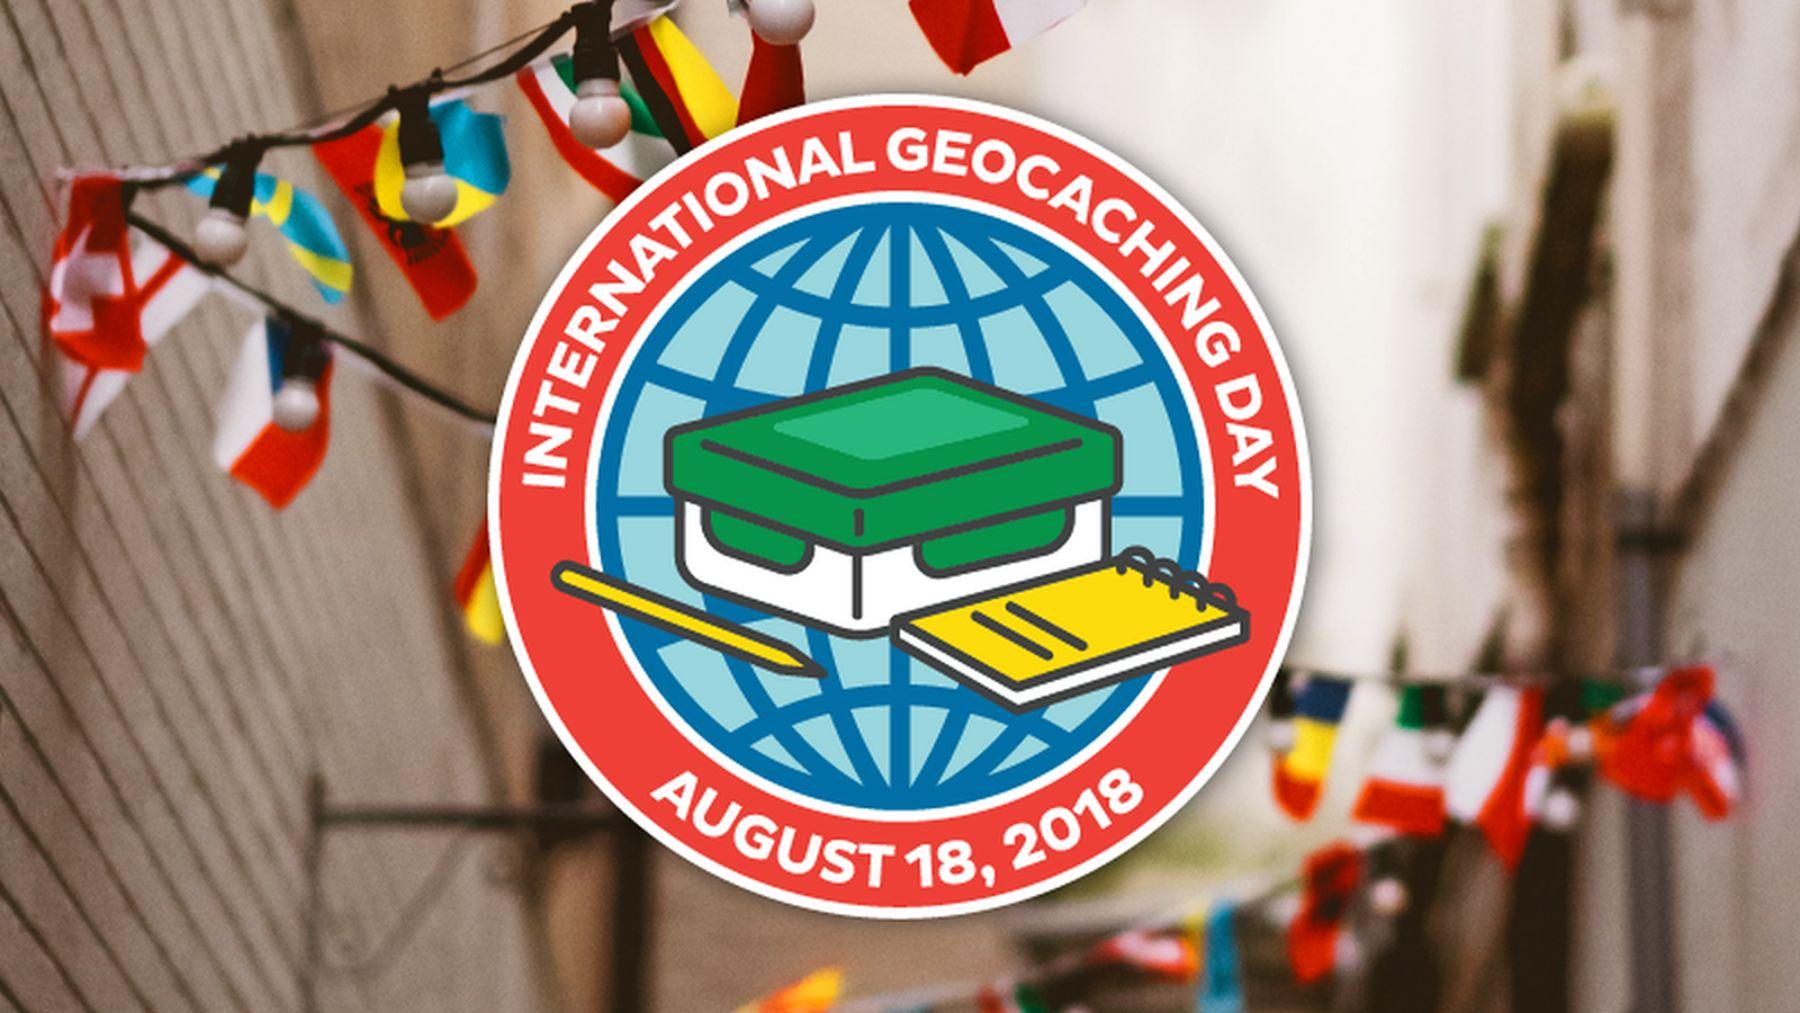 International Geocaching Day 2018